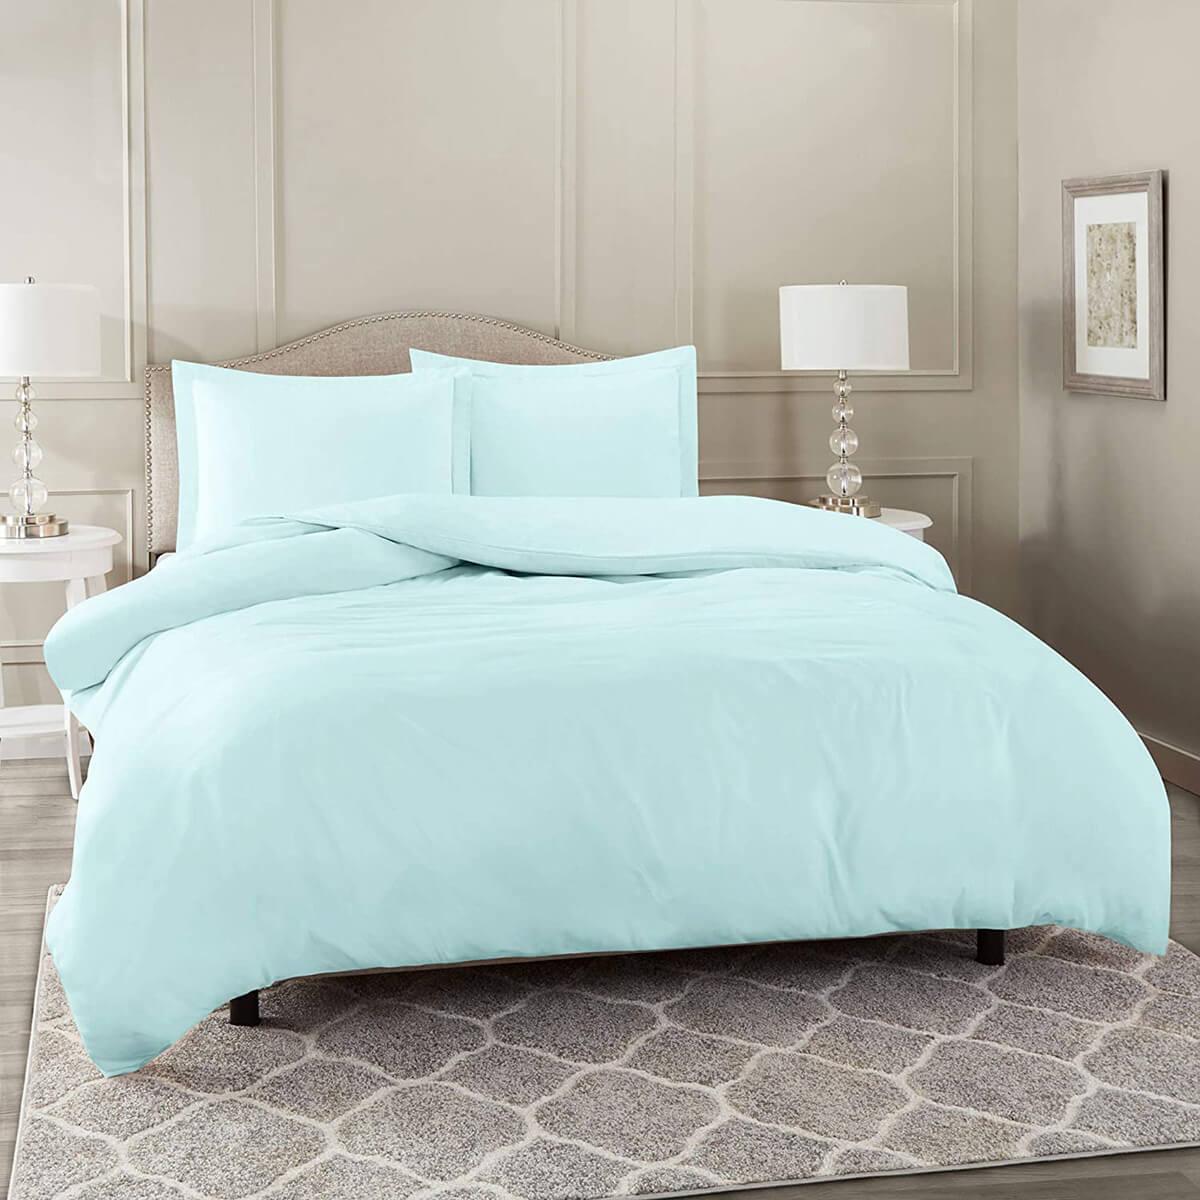 Sleek, Soft, and Simple Duvet